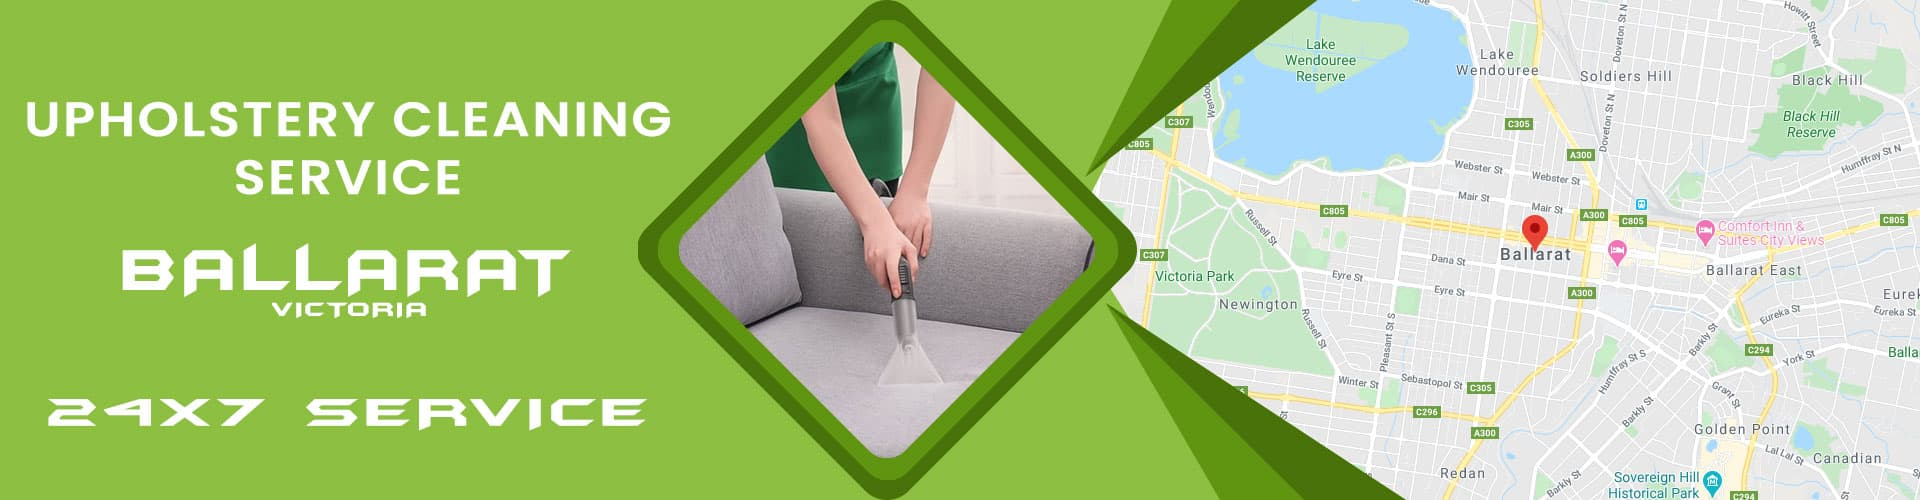 Upholstery Cleaning Ballarat